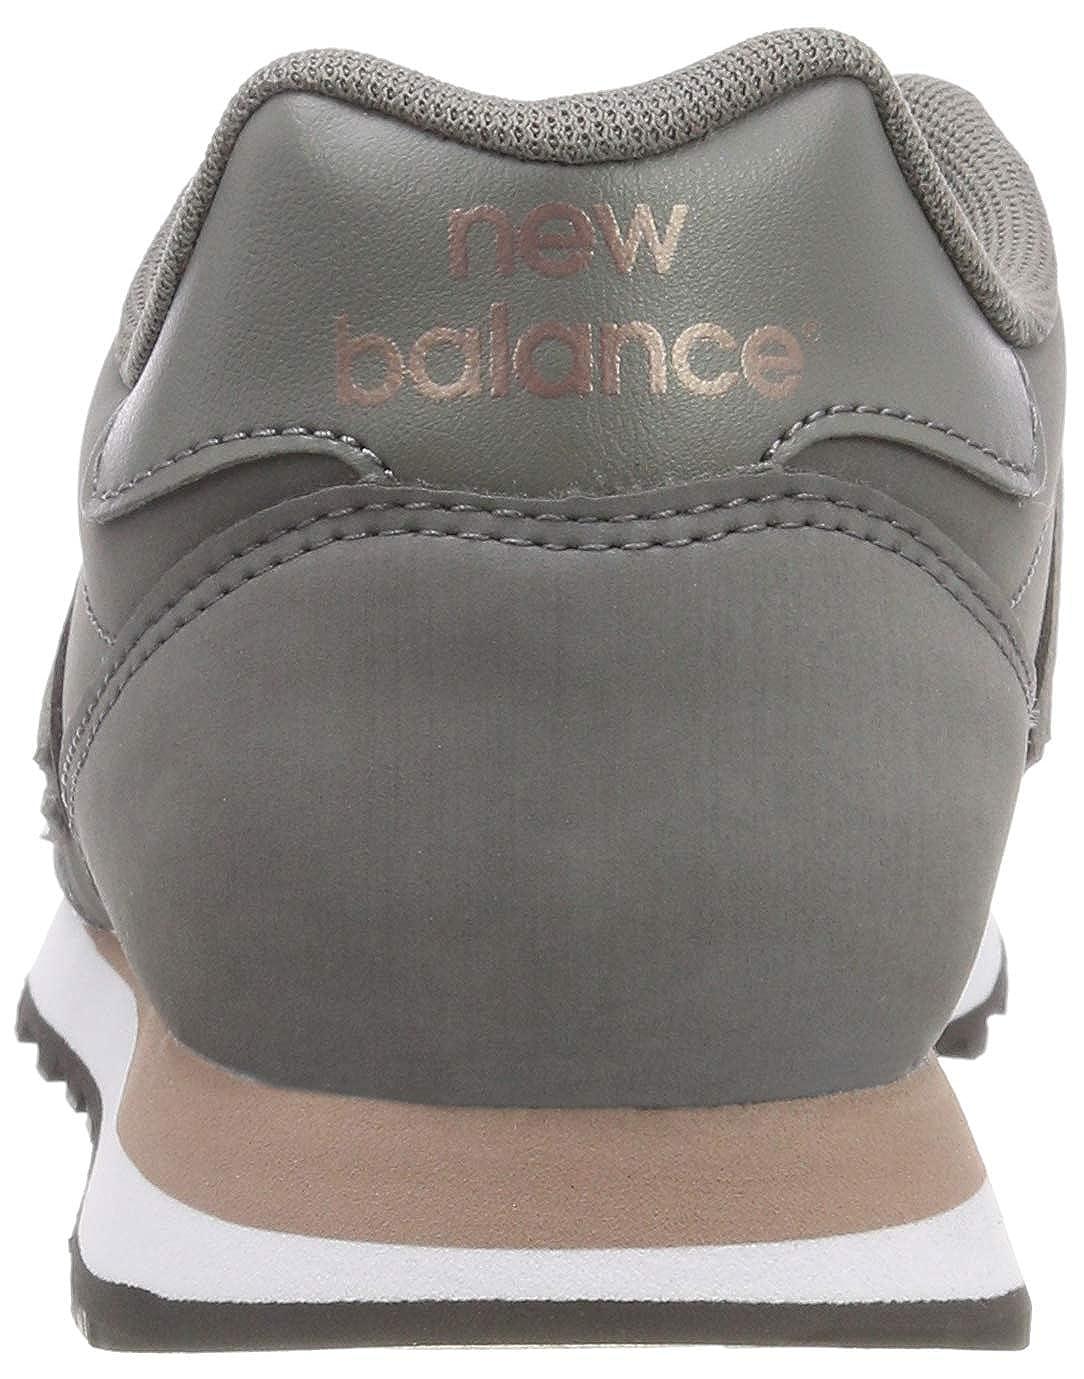 New Balance Damen 500 500 500 Turnschuhe schwarz weiß blau 36 EU 63ffc5